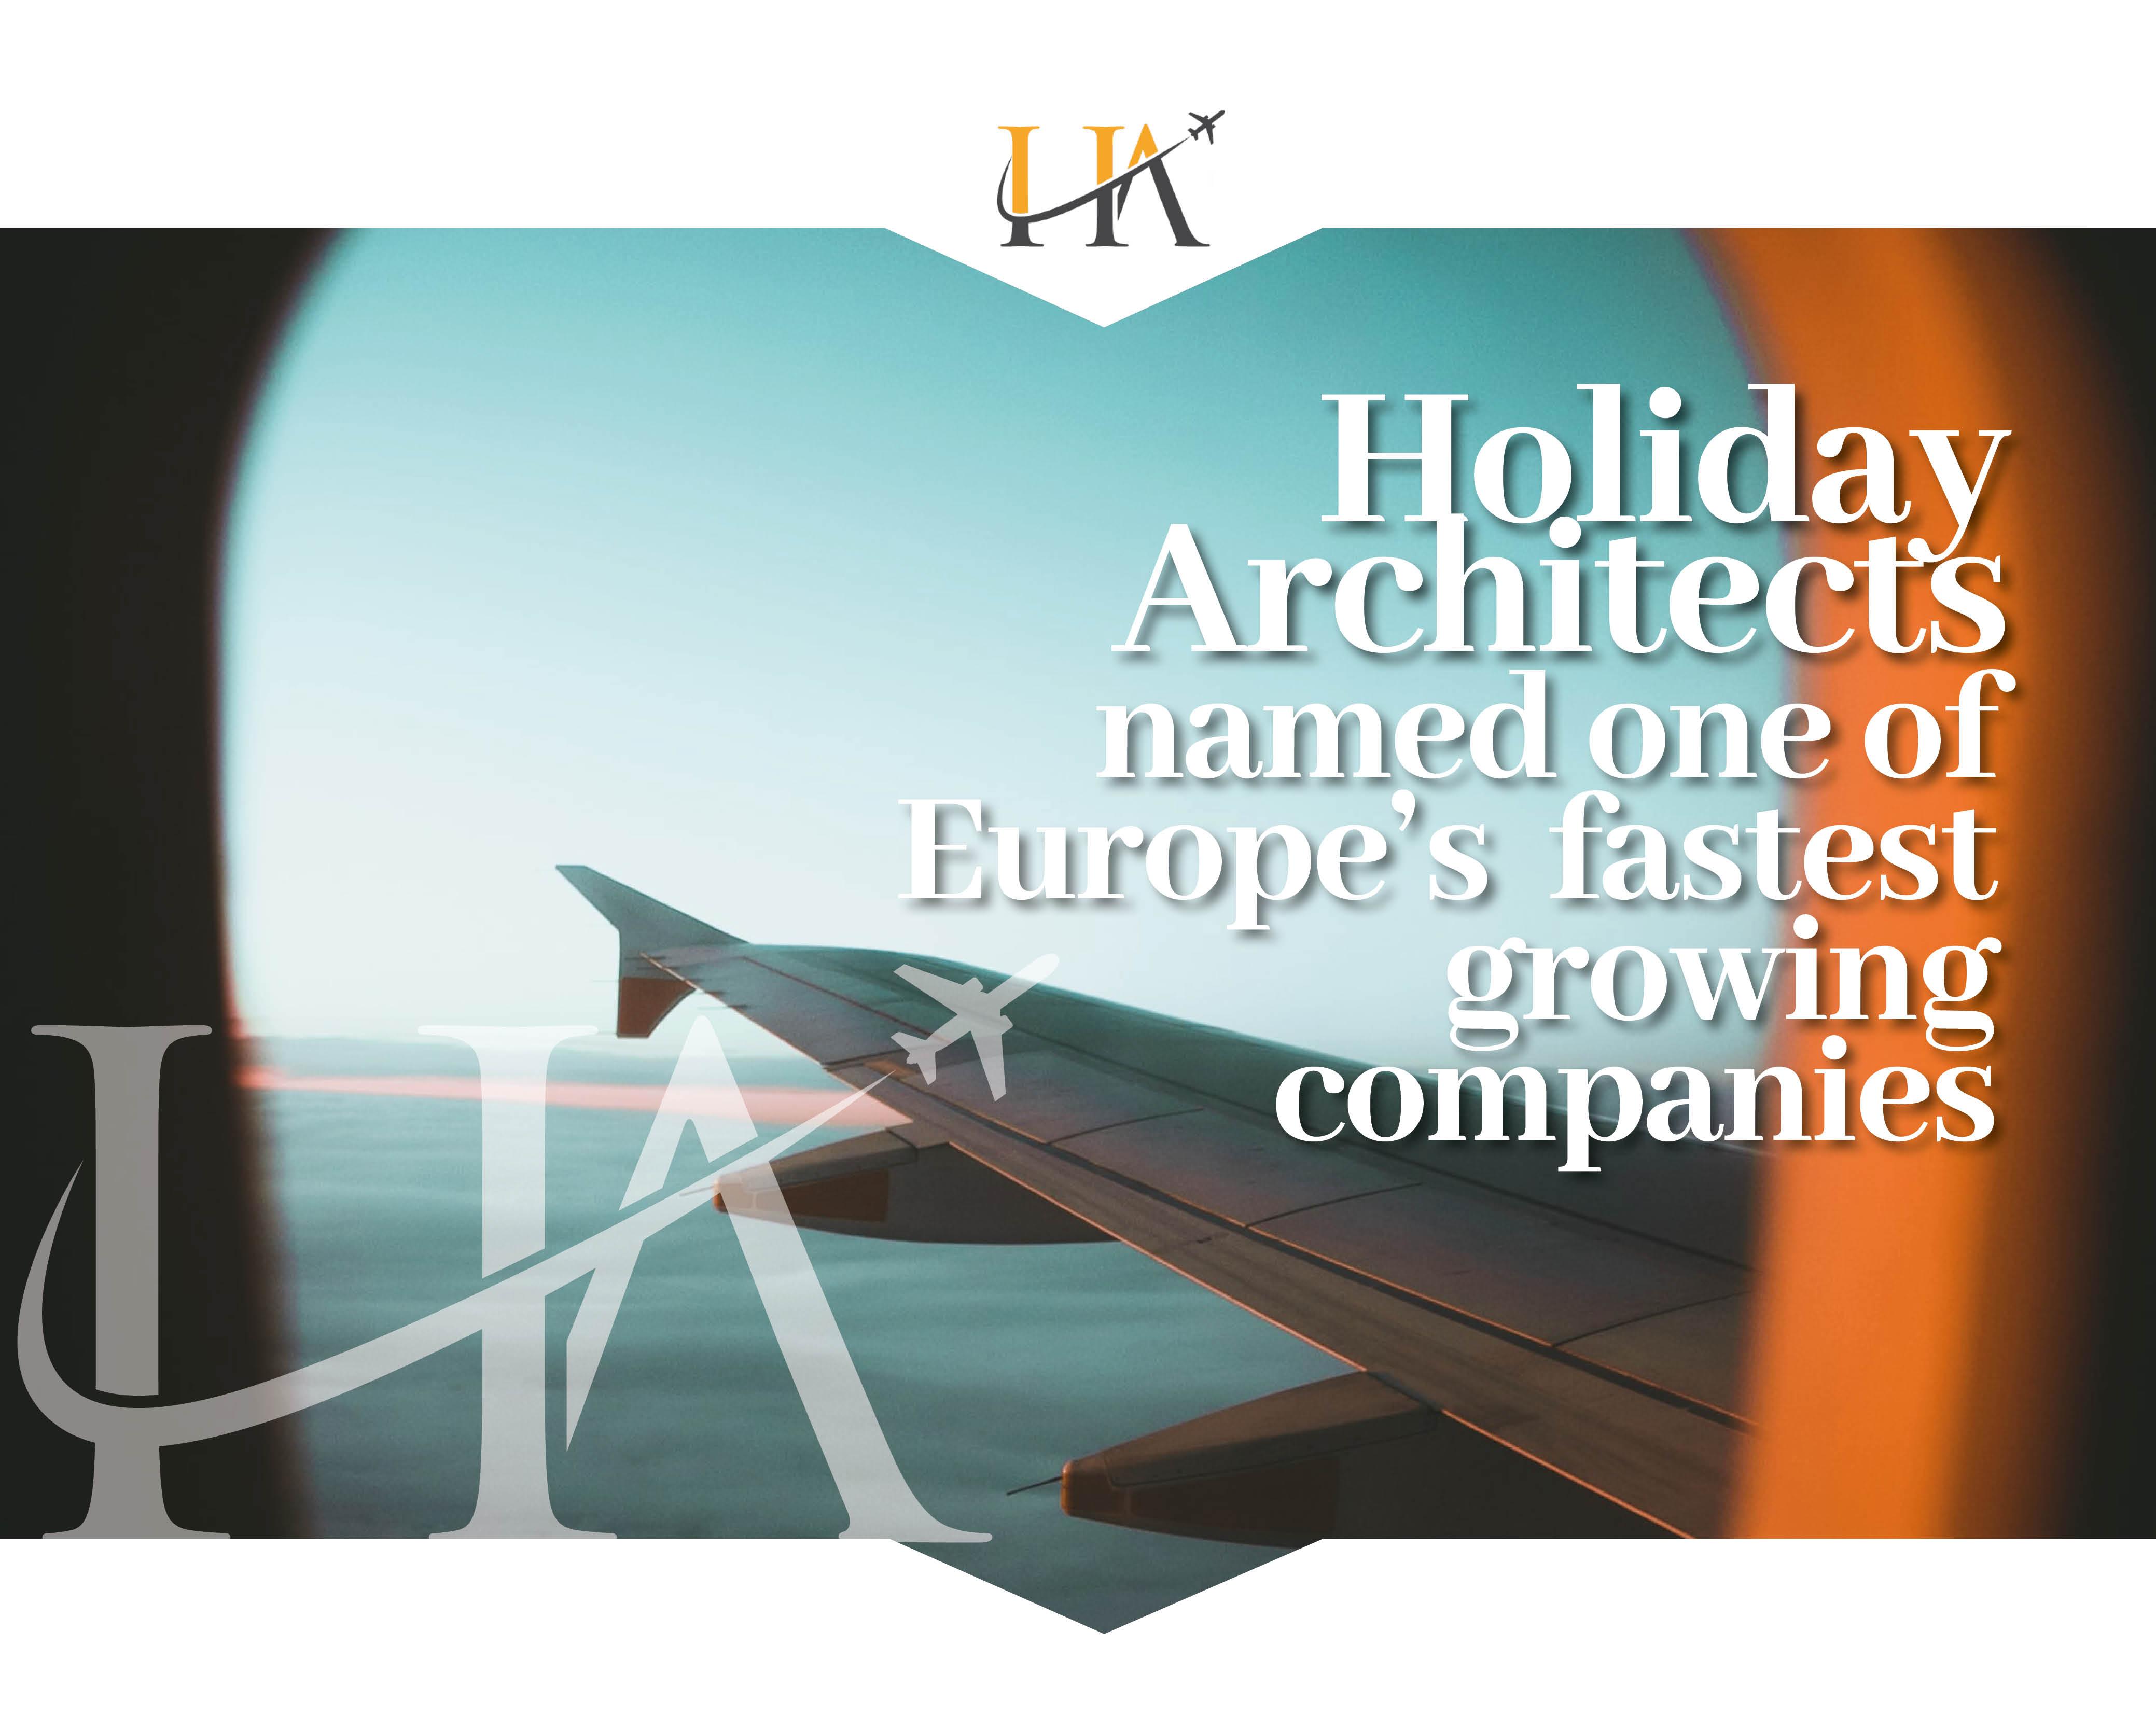 FT1000 - Holiday Architects